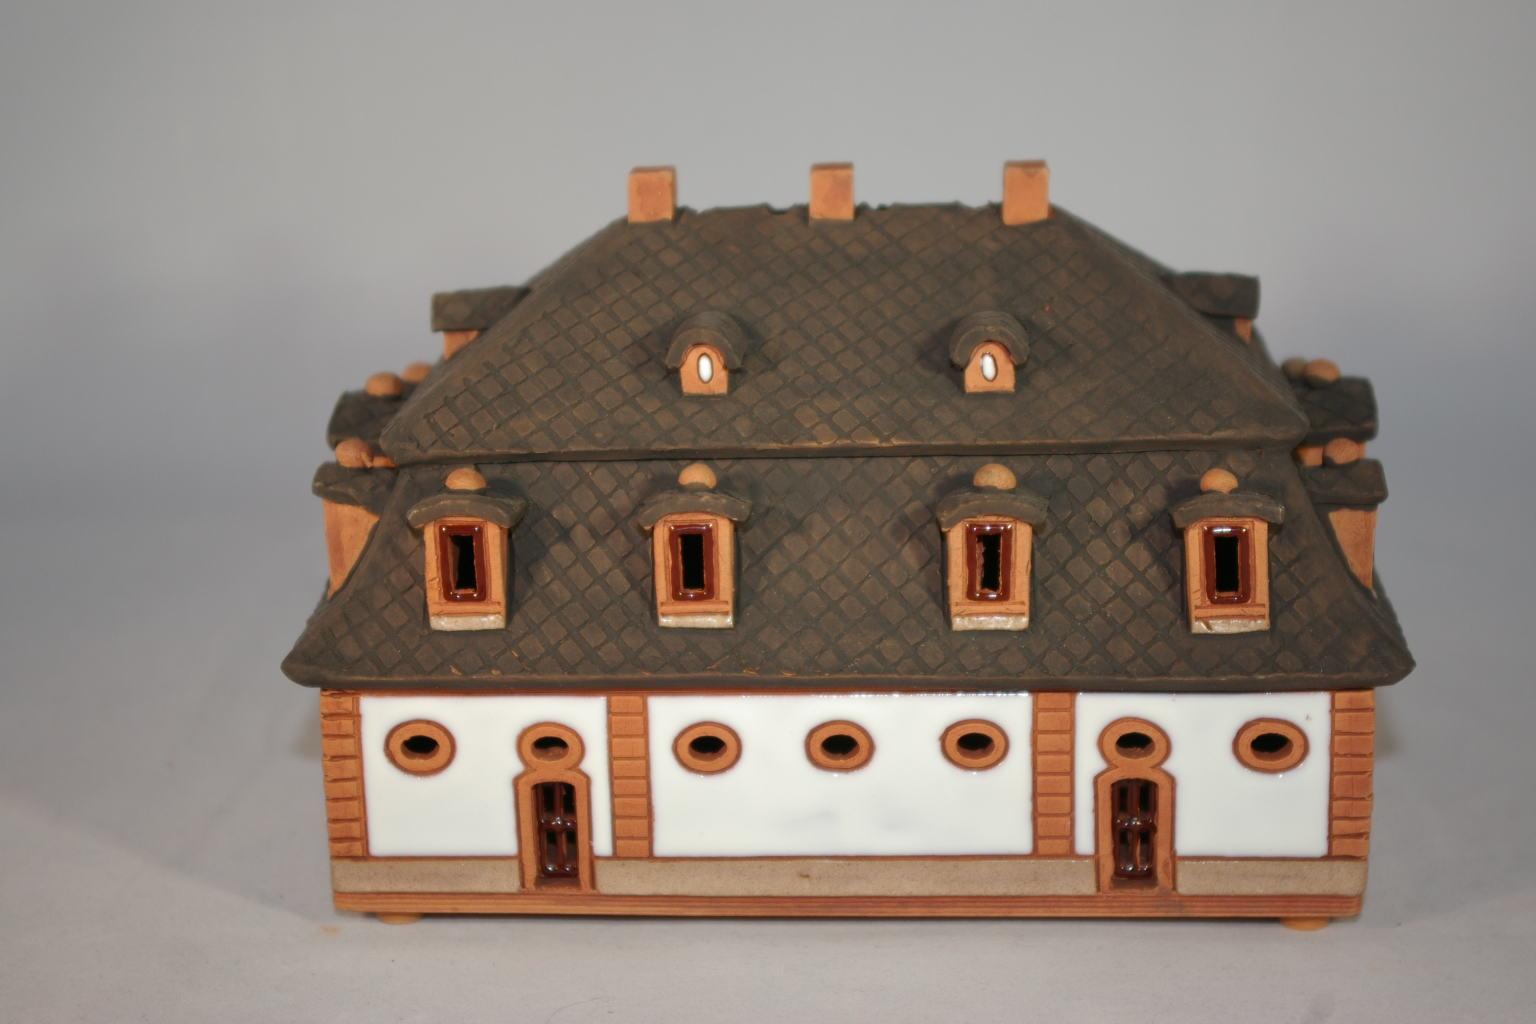 hauptwache frankfurt keramik seifert ronny seifert toepferei seifert ihr namenstassen und. Black Bedroom Furniture Sets. Home Design Ideas